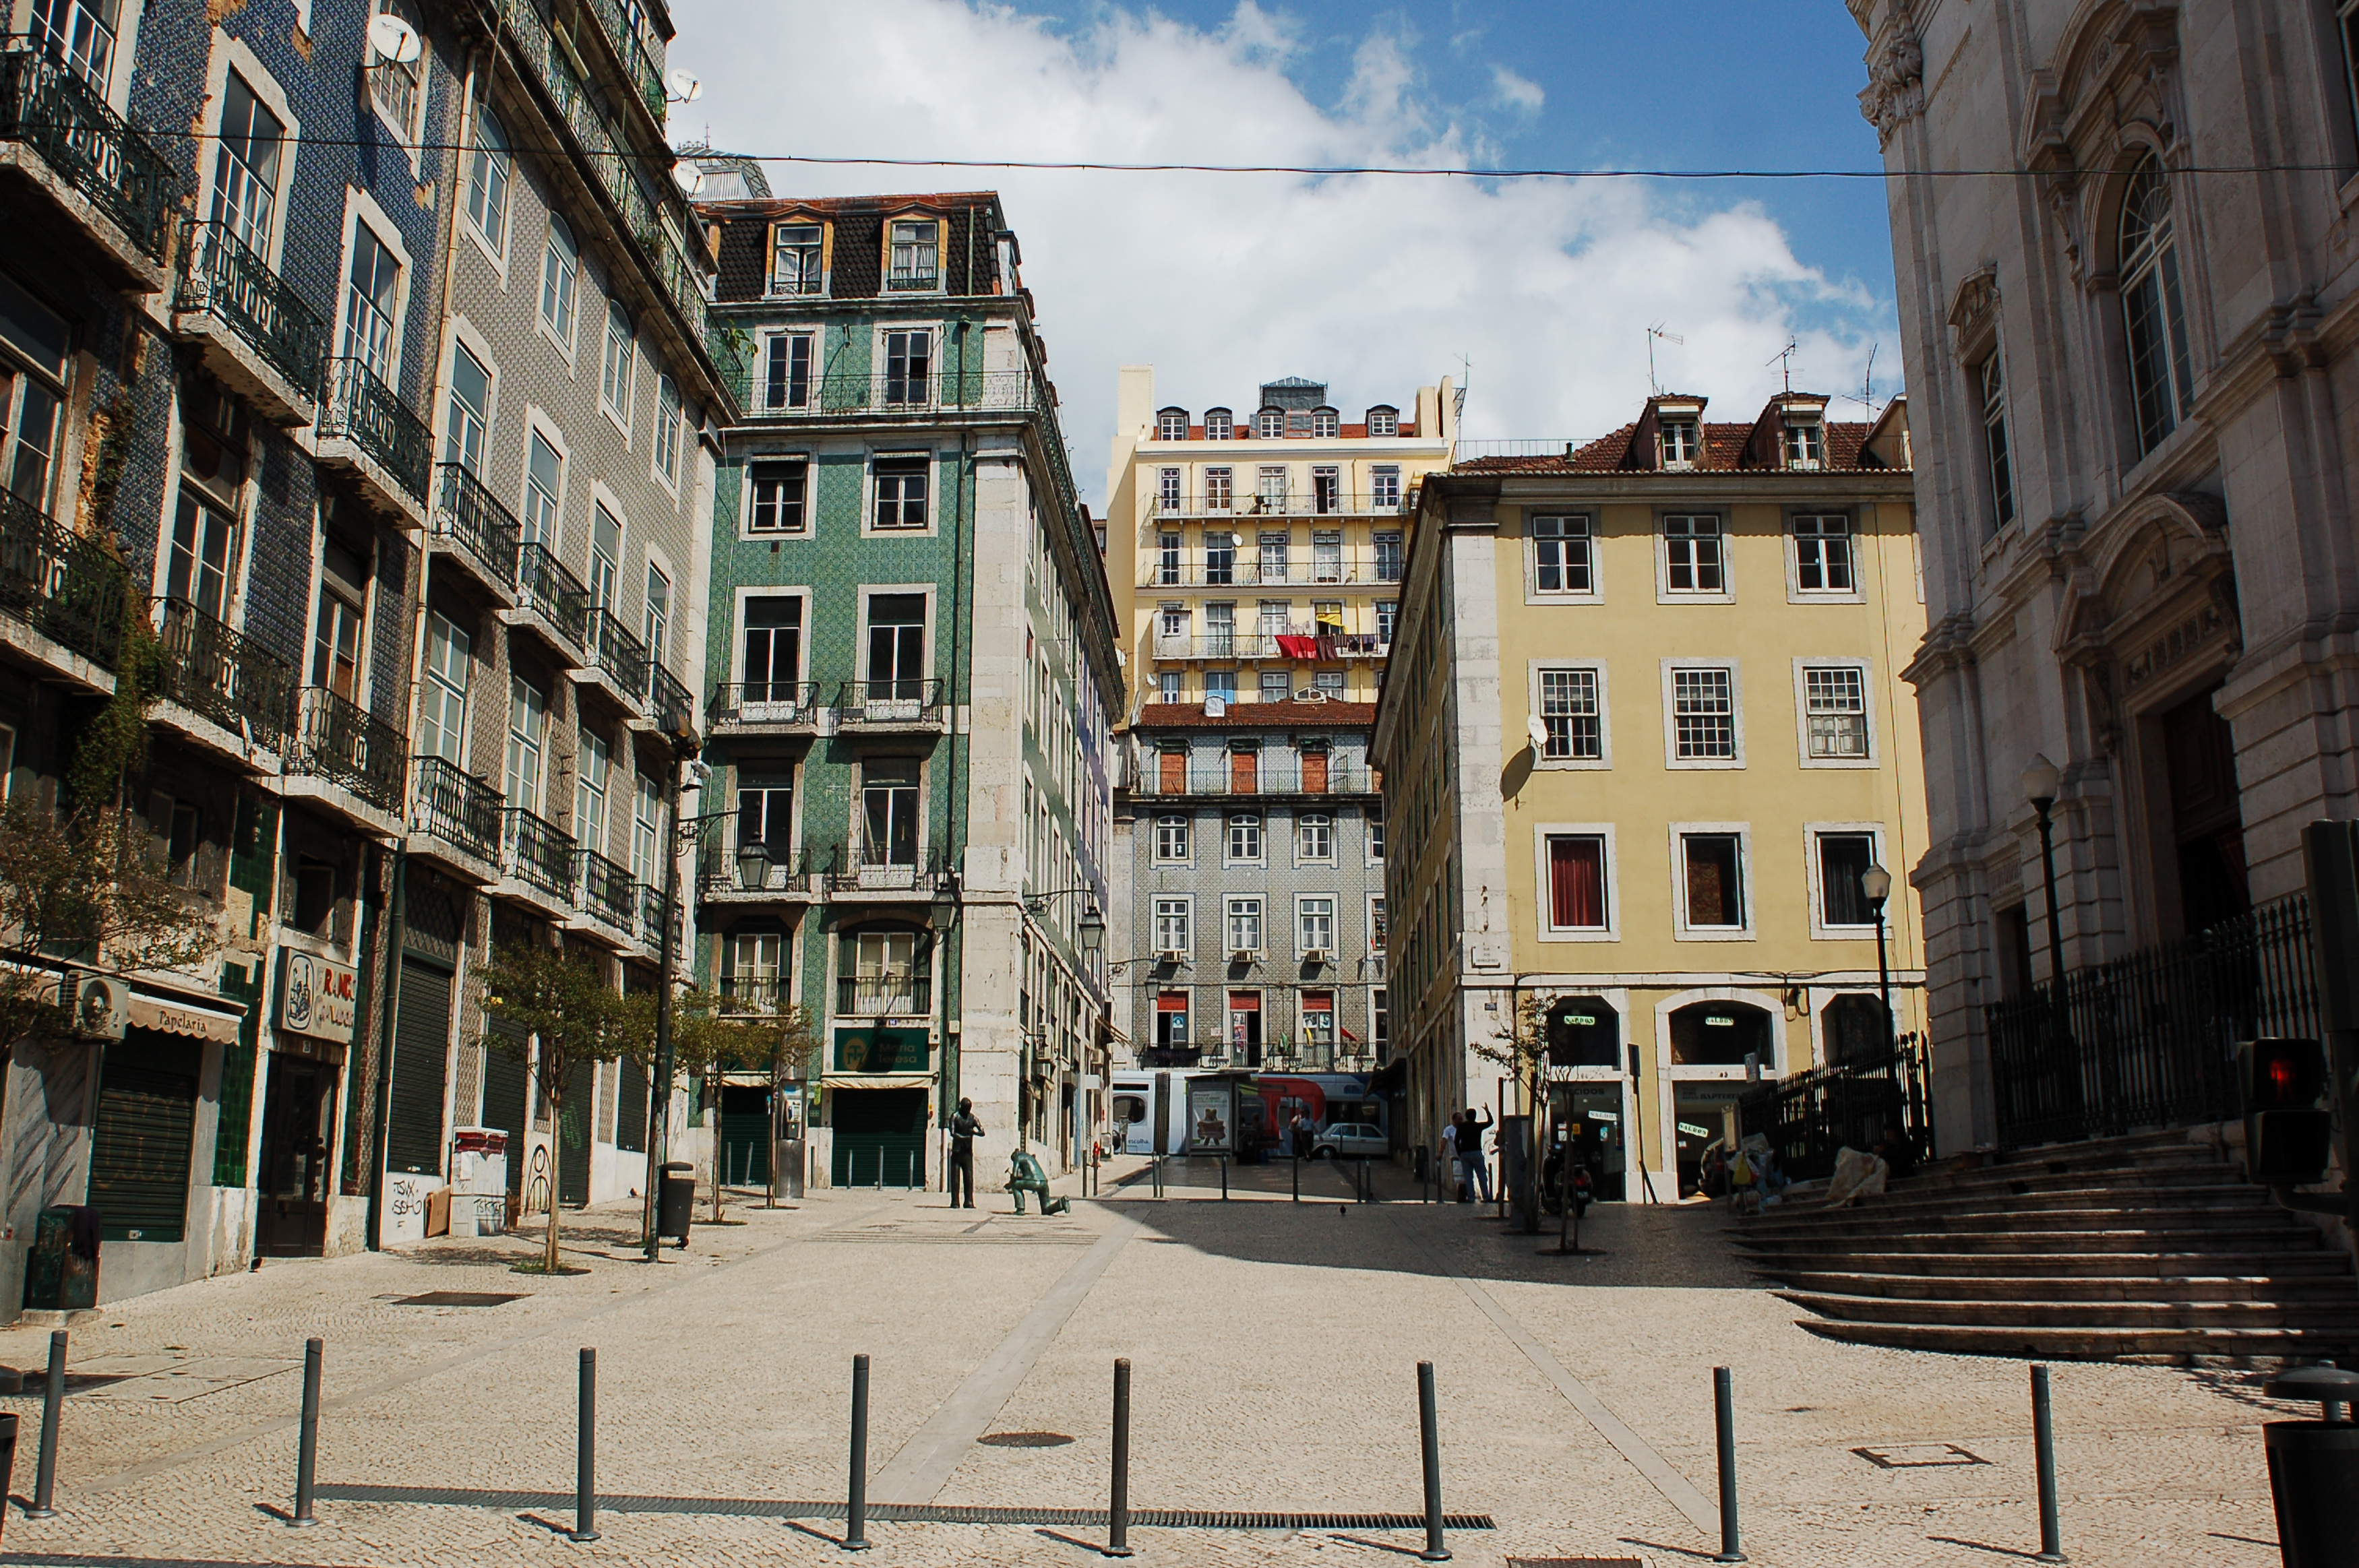 File:Streets of Lisbon. Portugal, Southwestern Europe.jpg ...